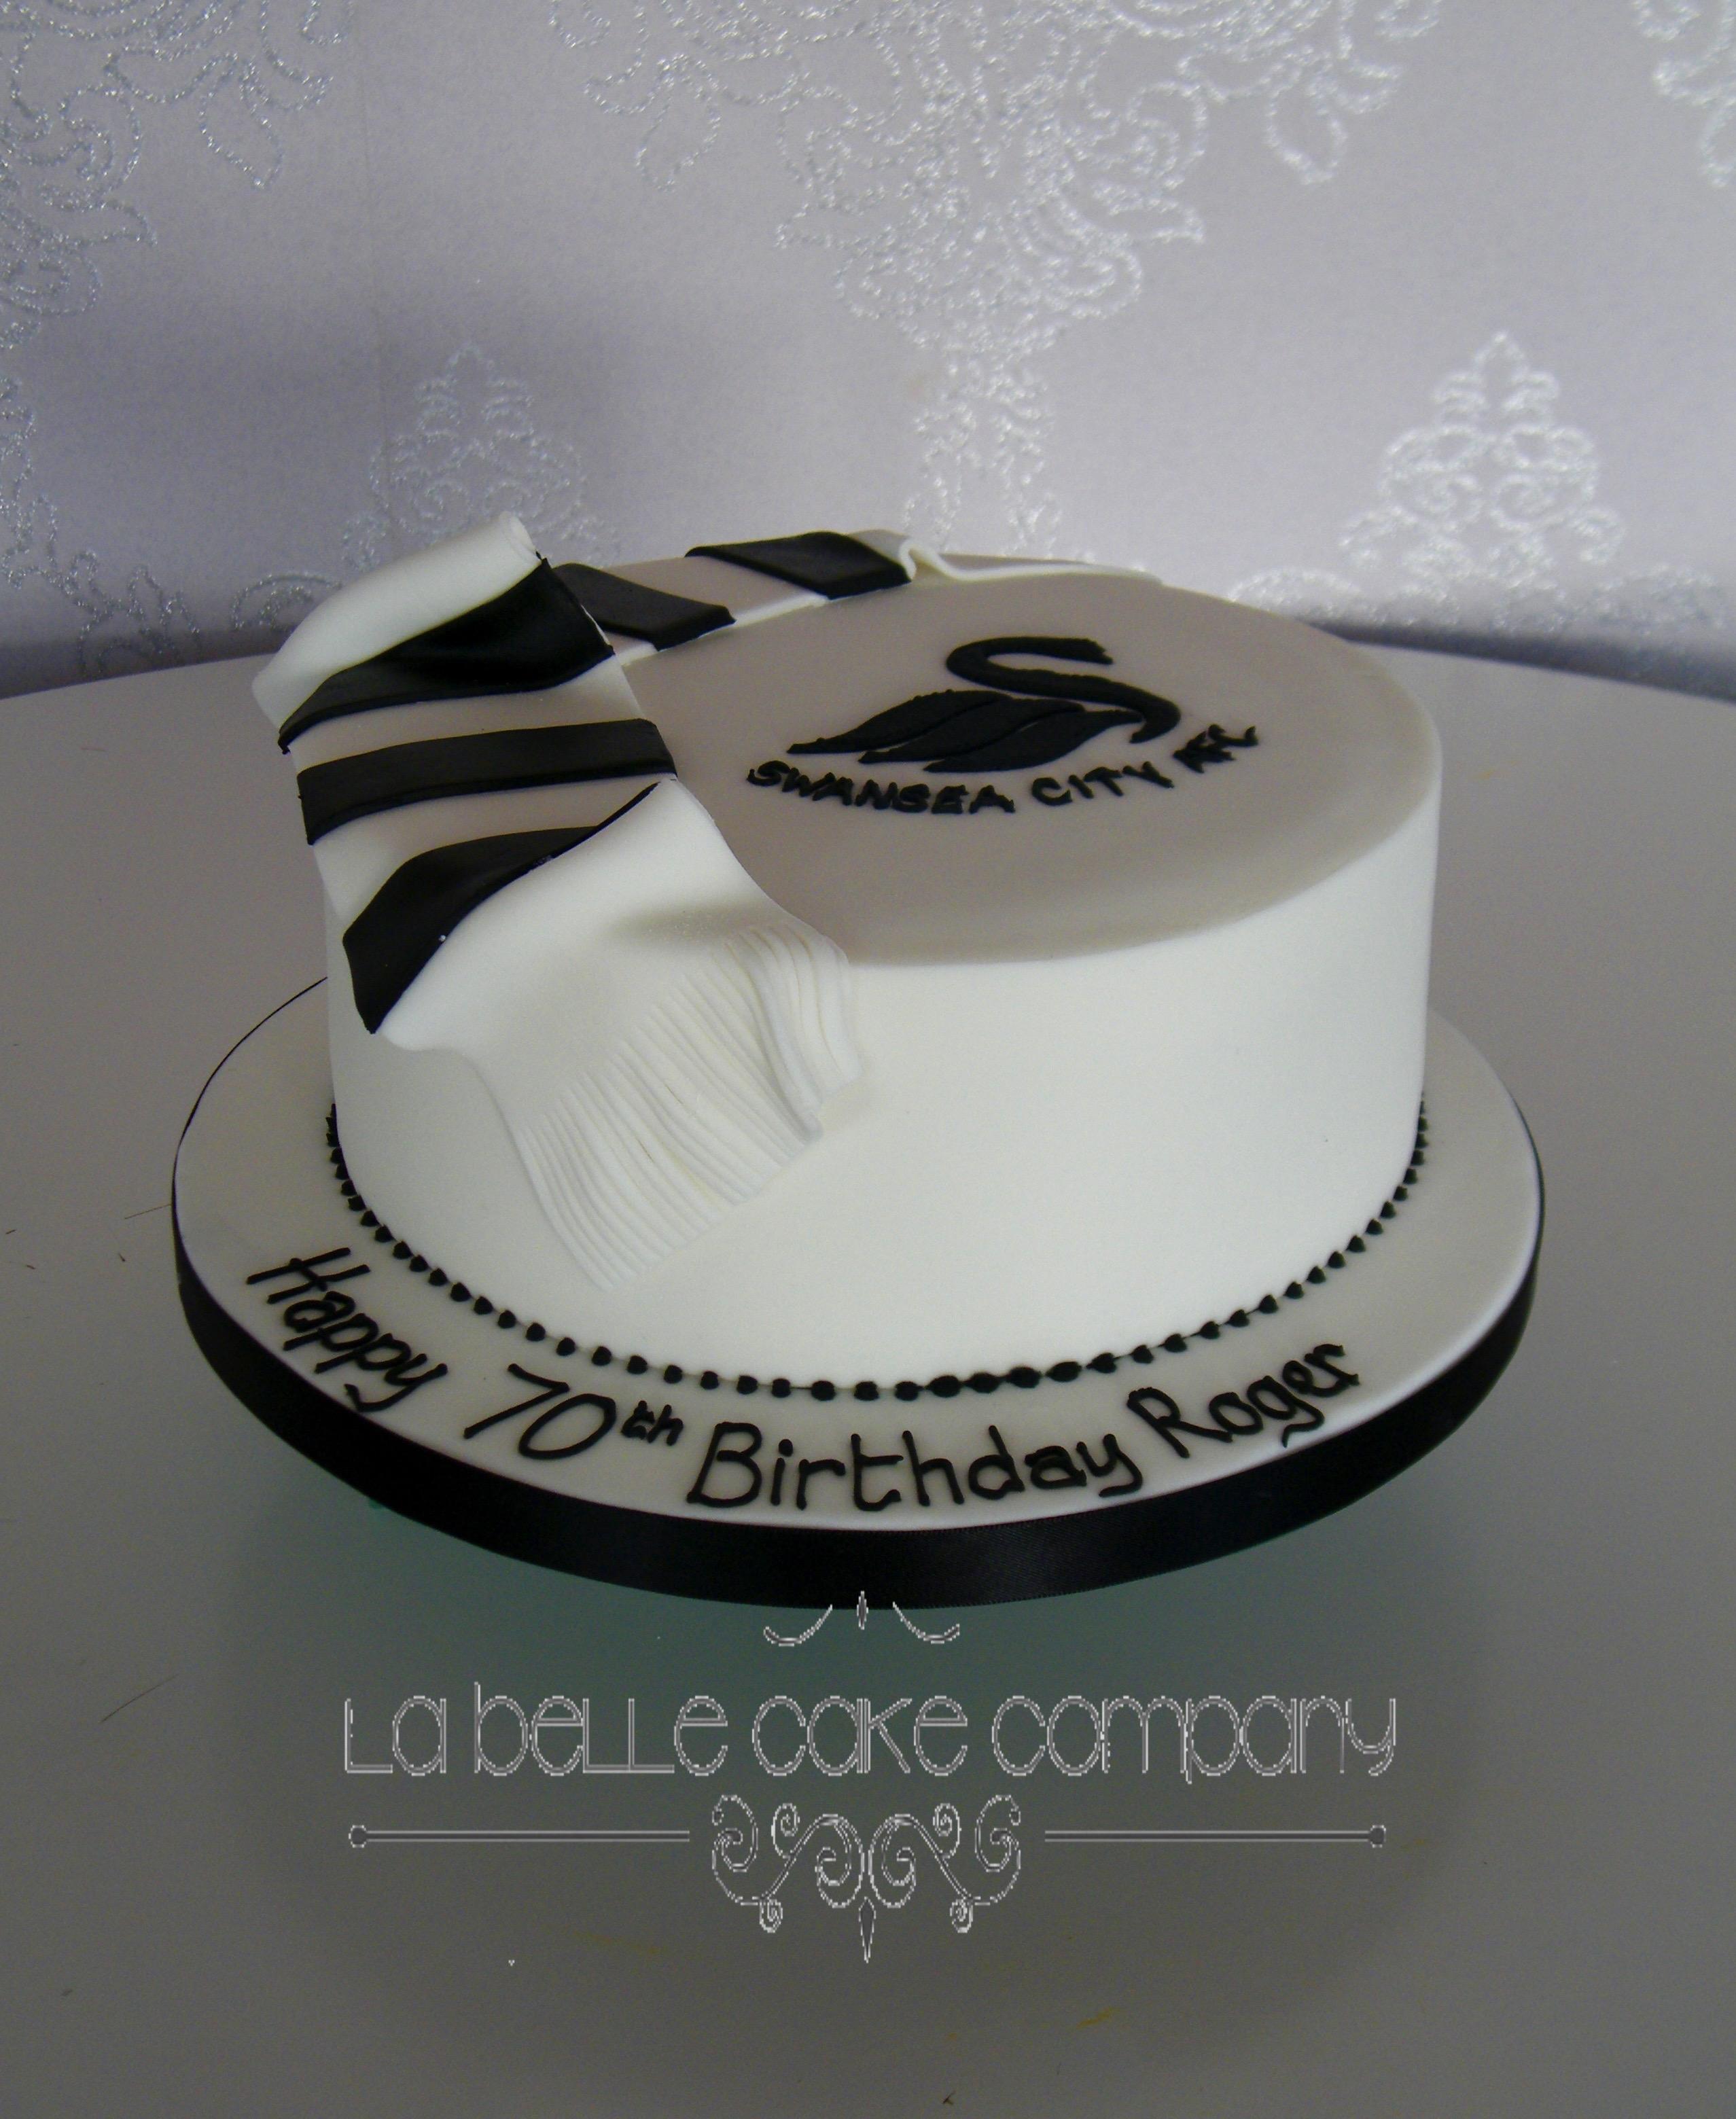 Football Supporter Swansea City Male Birthday Cakes Hertfordshire Bedfordshire Buckinghamshire London